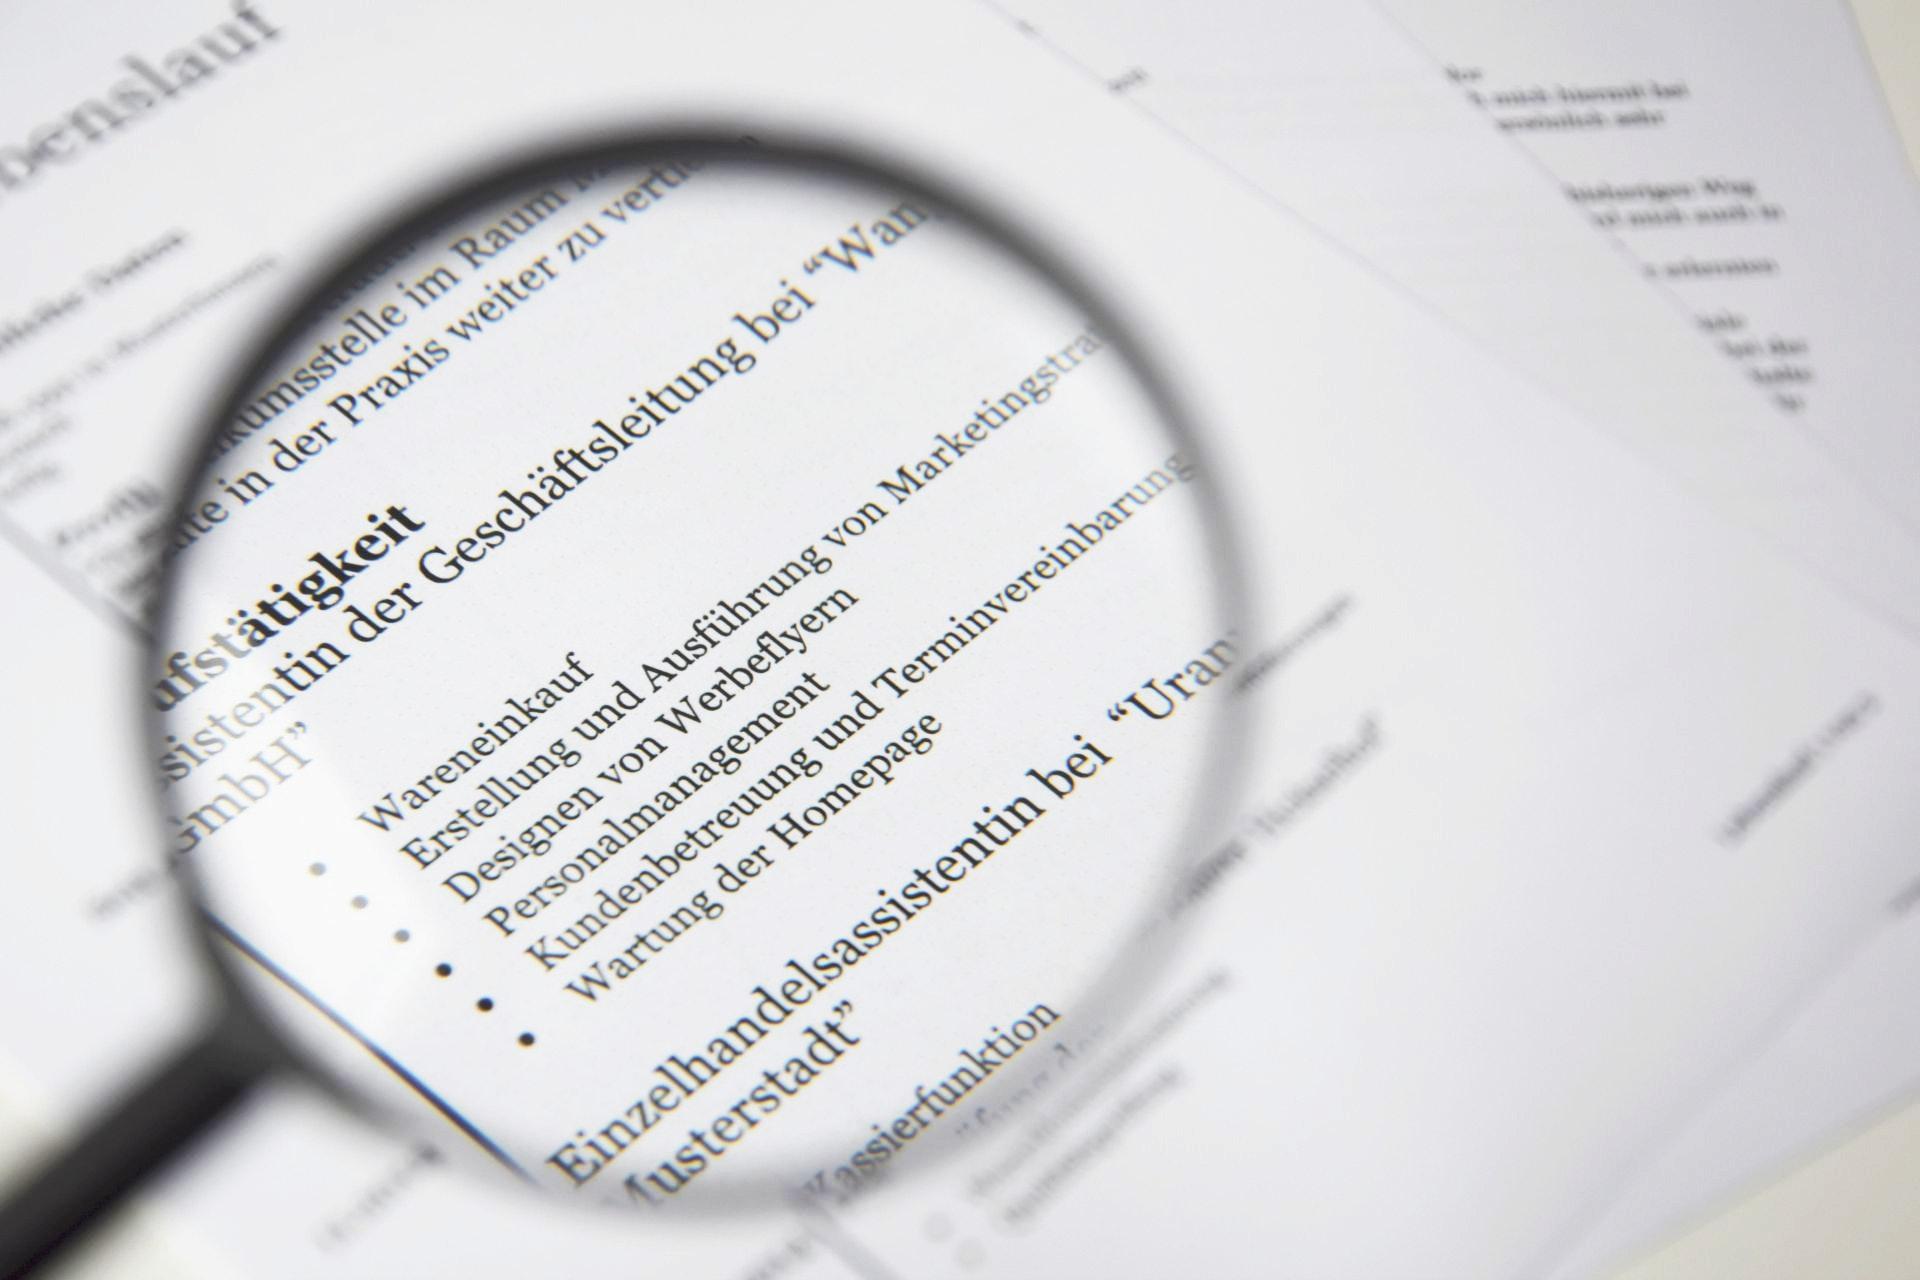 Viza-studentska-nemacka-blokiran-racun-banka-dokumenta-procedure-cena-via-academica